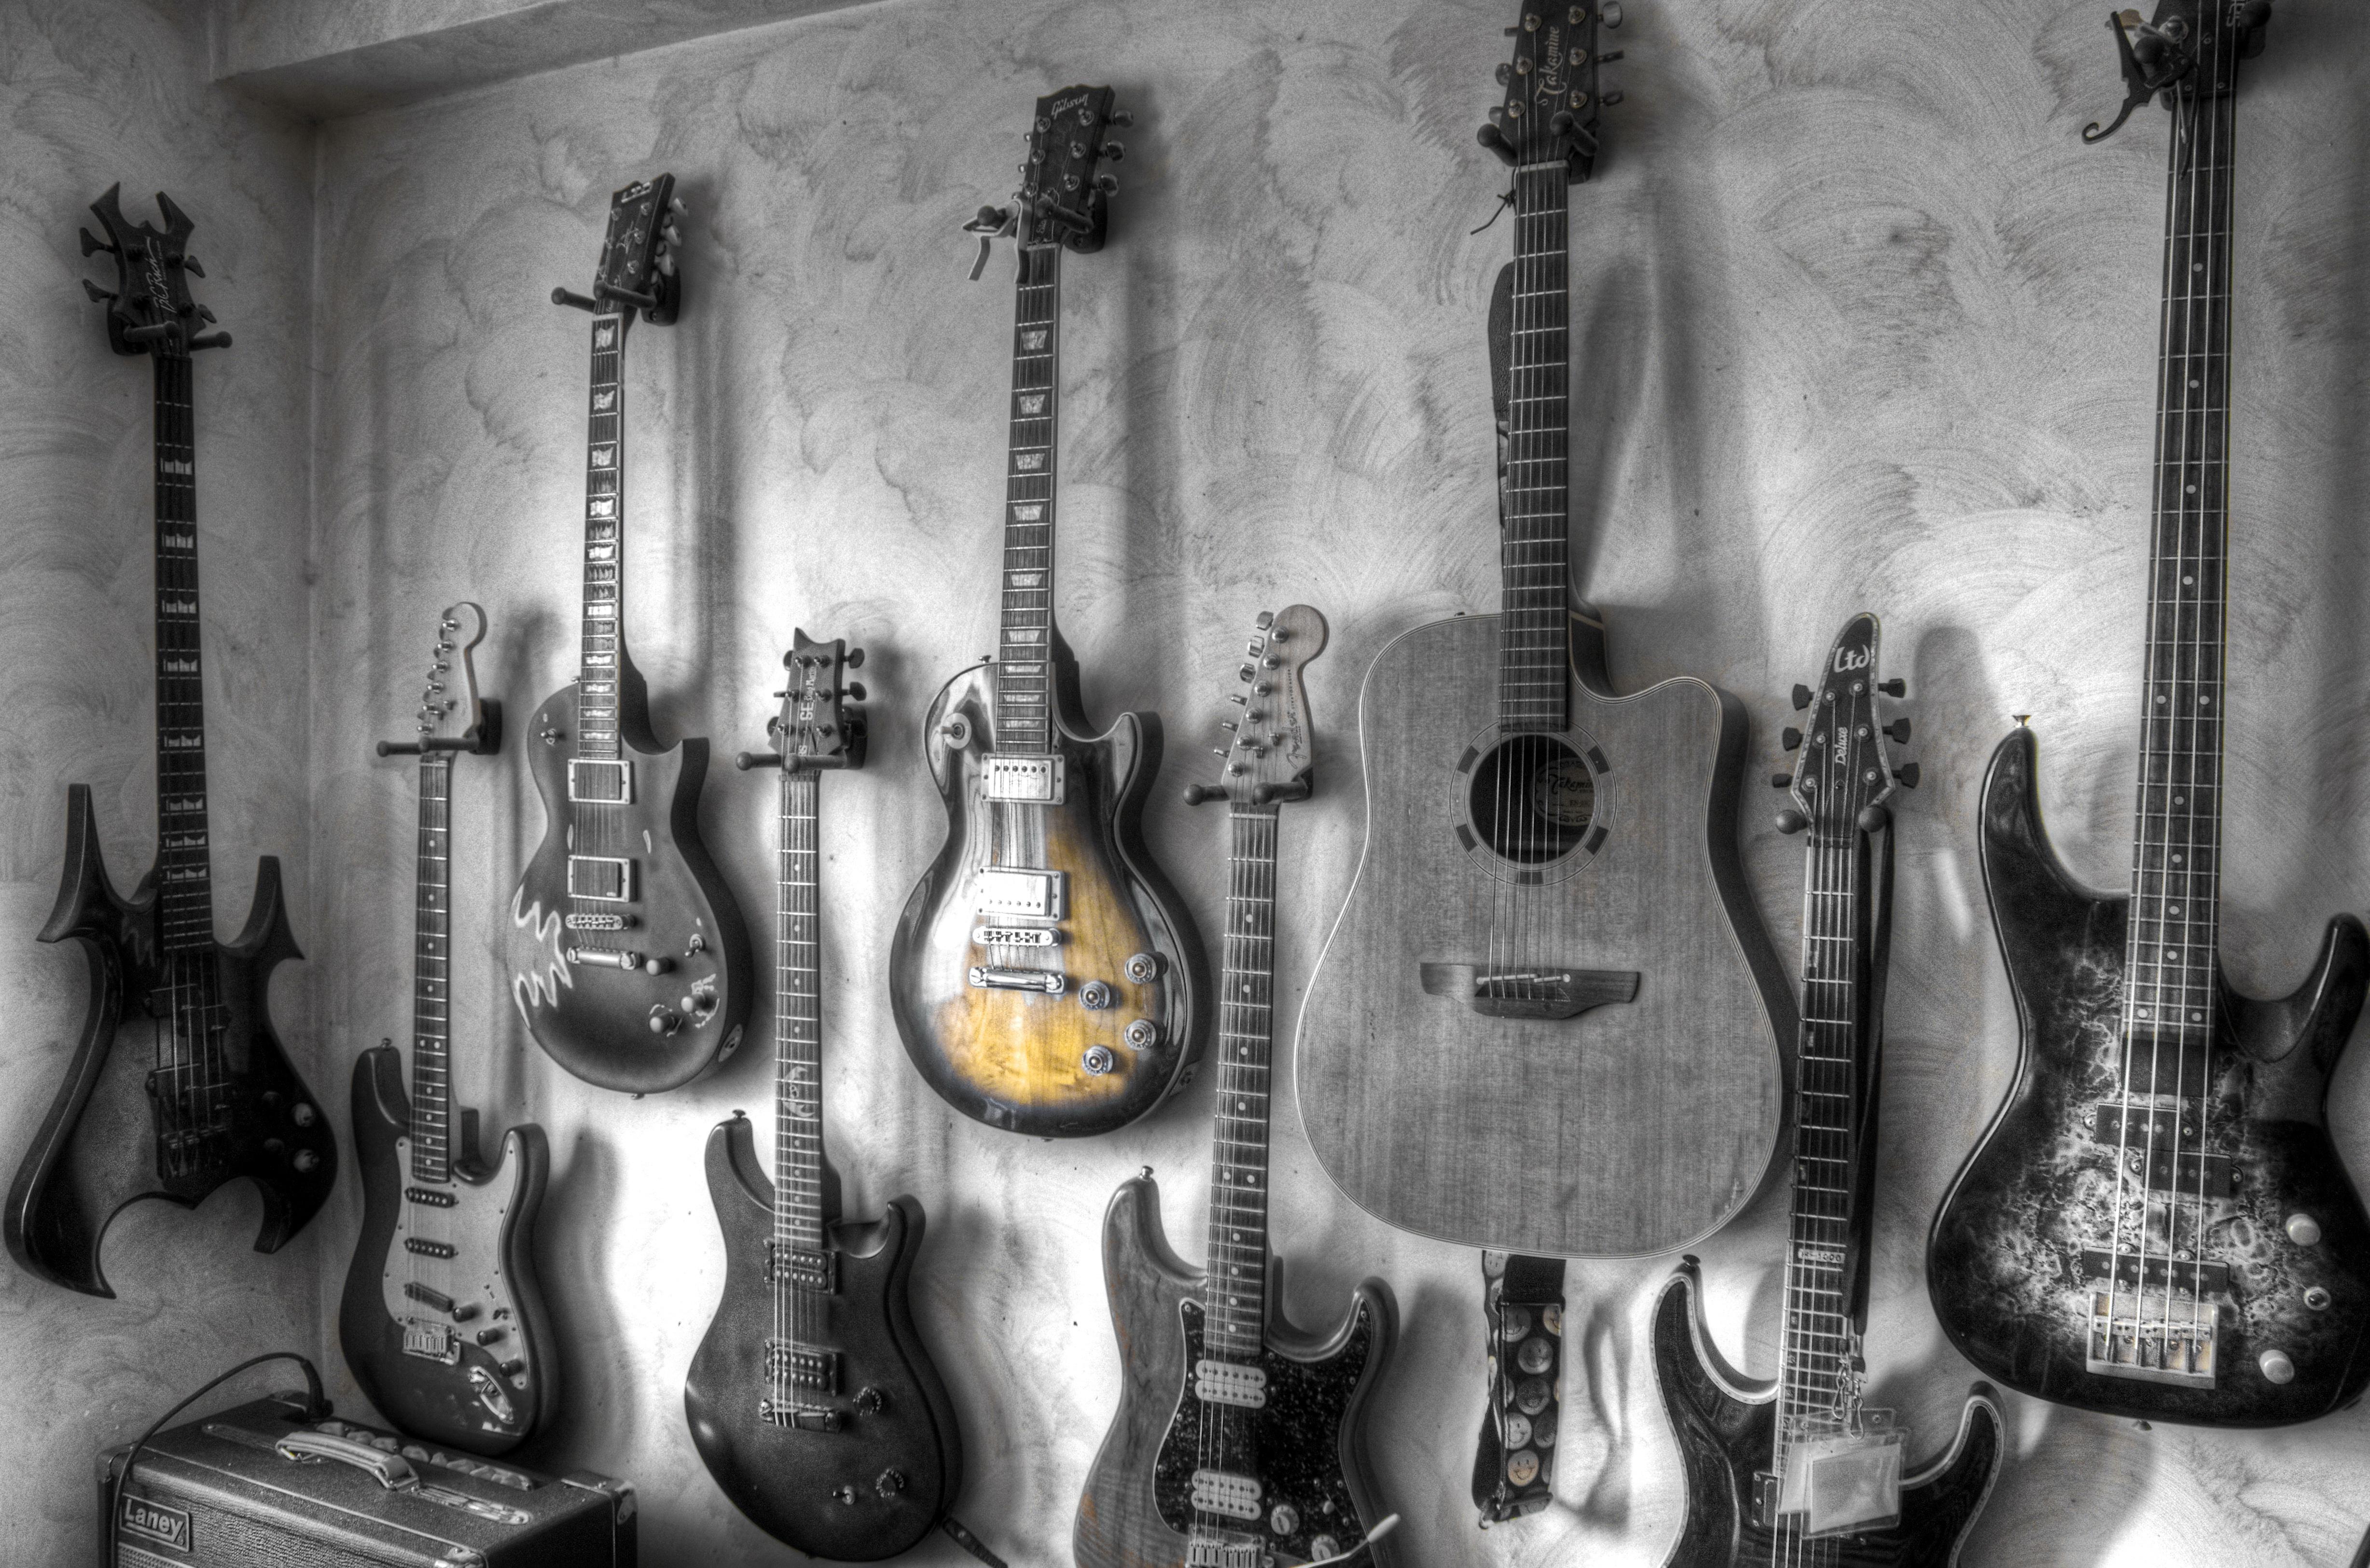 Guitar 4k Ultra HD Wallpaper